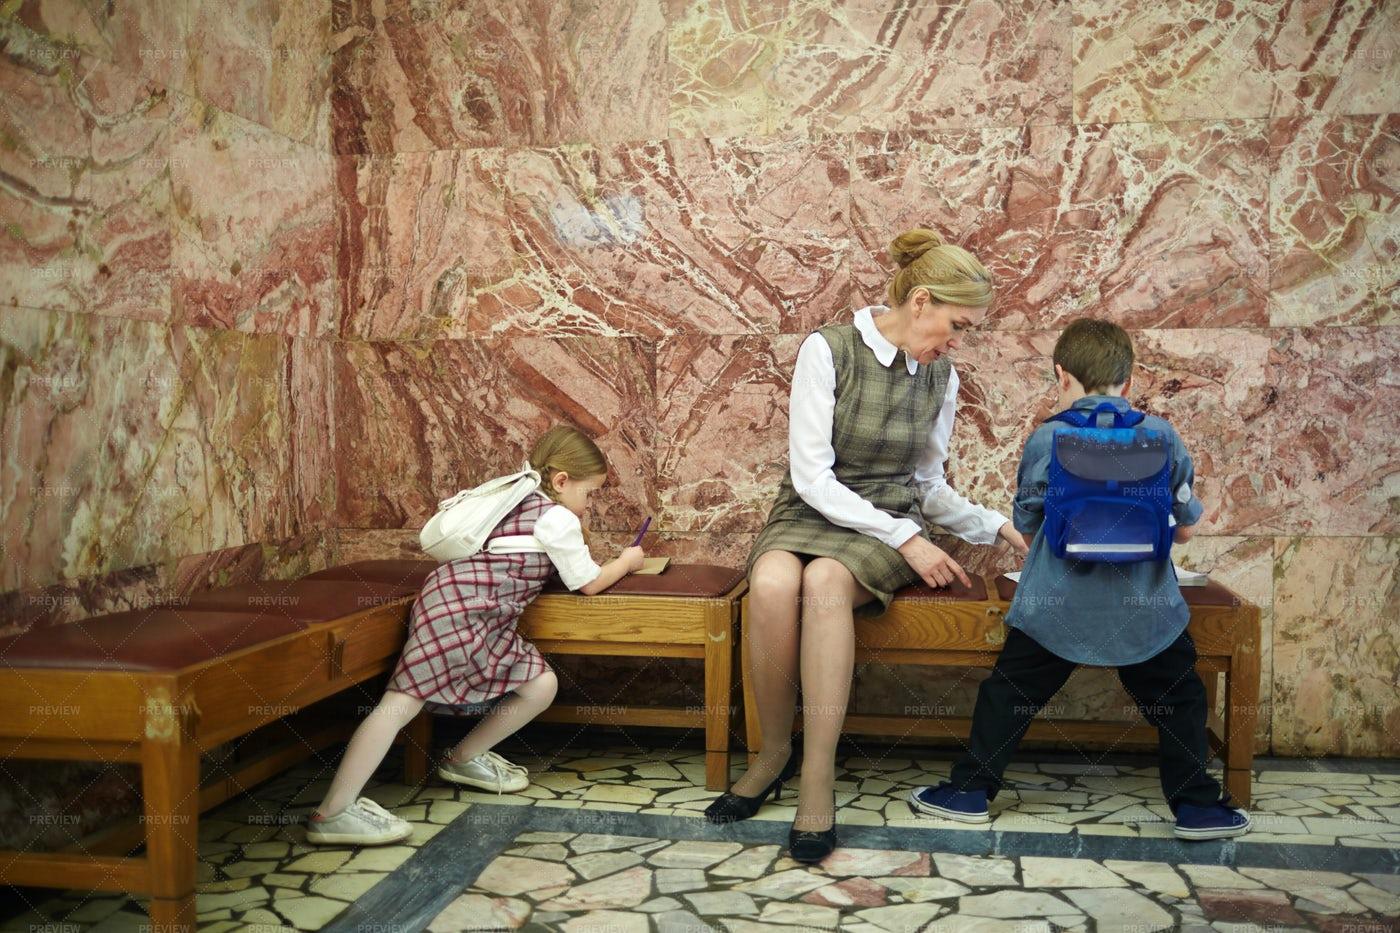 Teacher And Schoolkids In Museum: Stock Photos